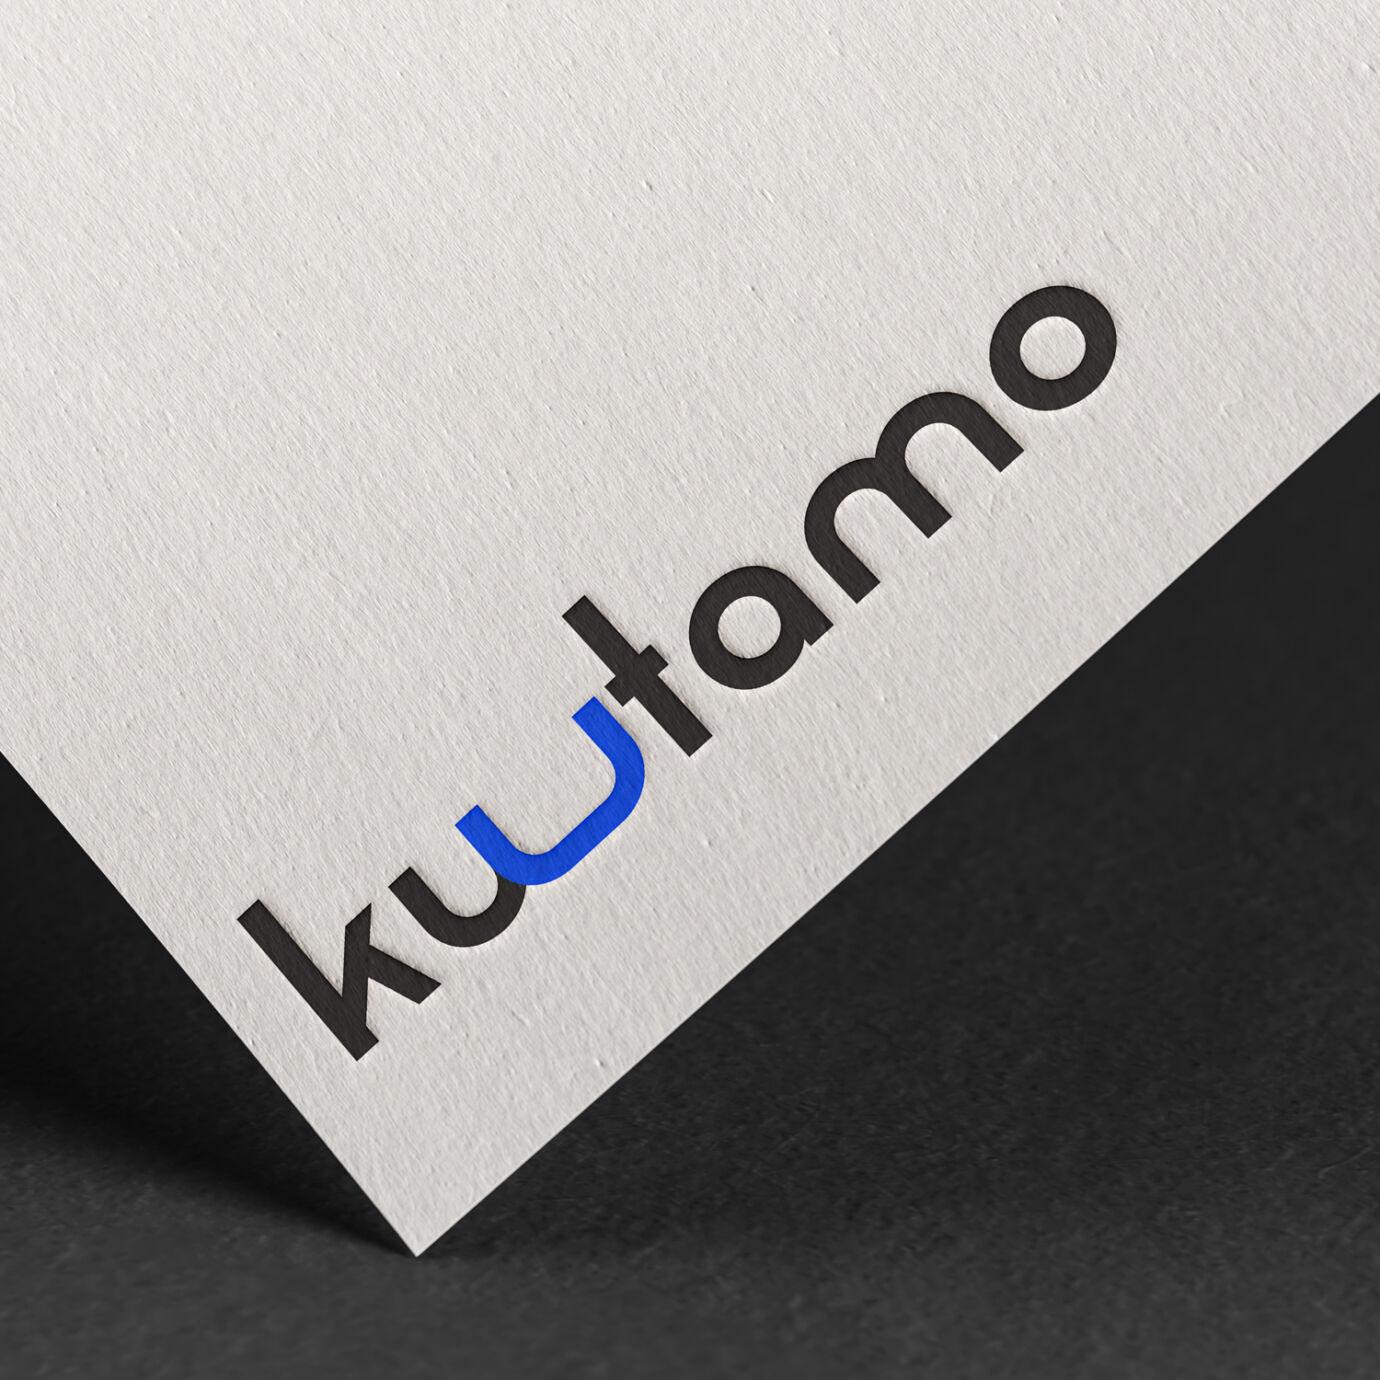 Sambou brand webdesigner kuutamo